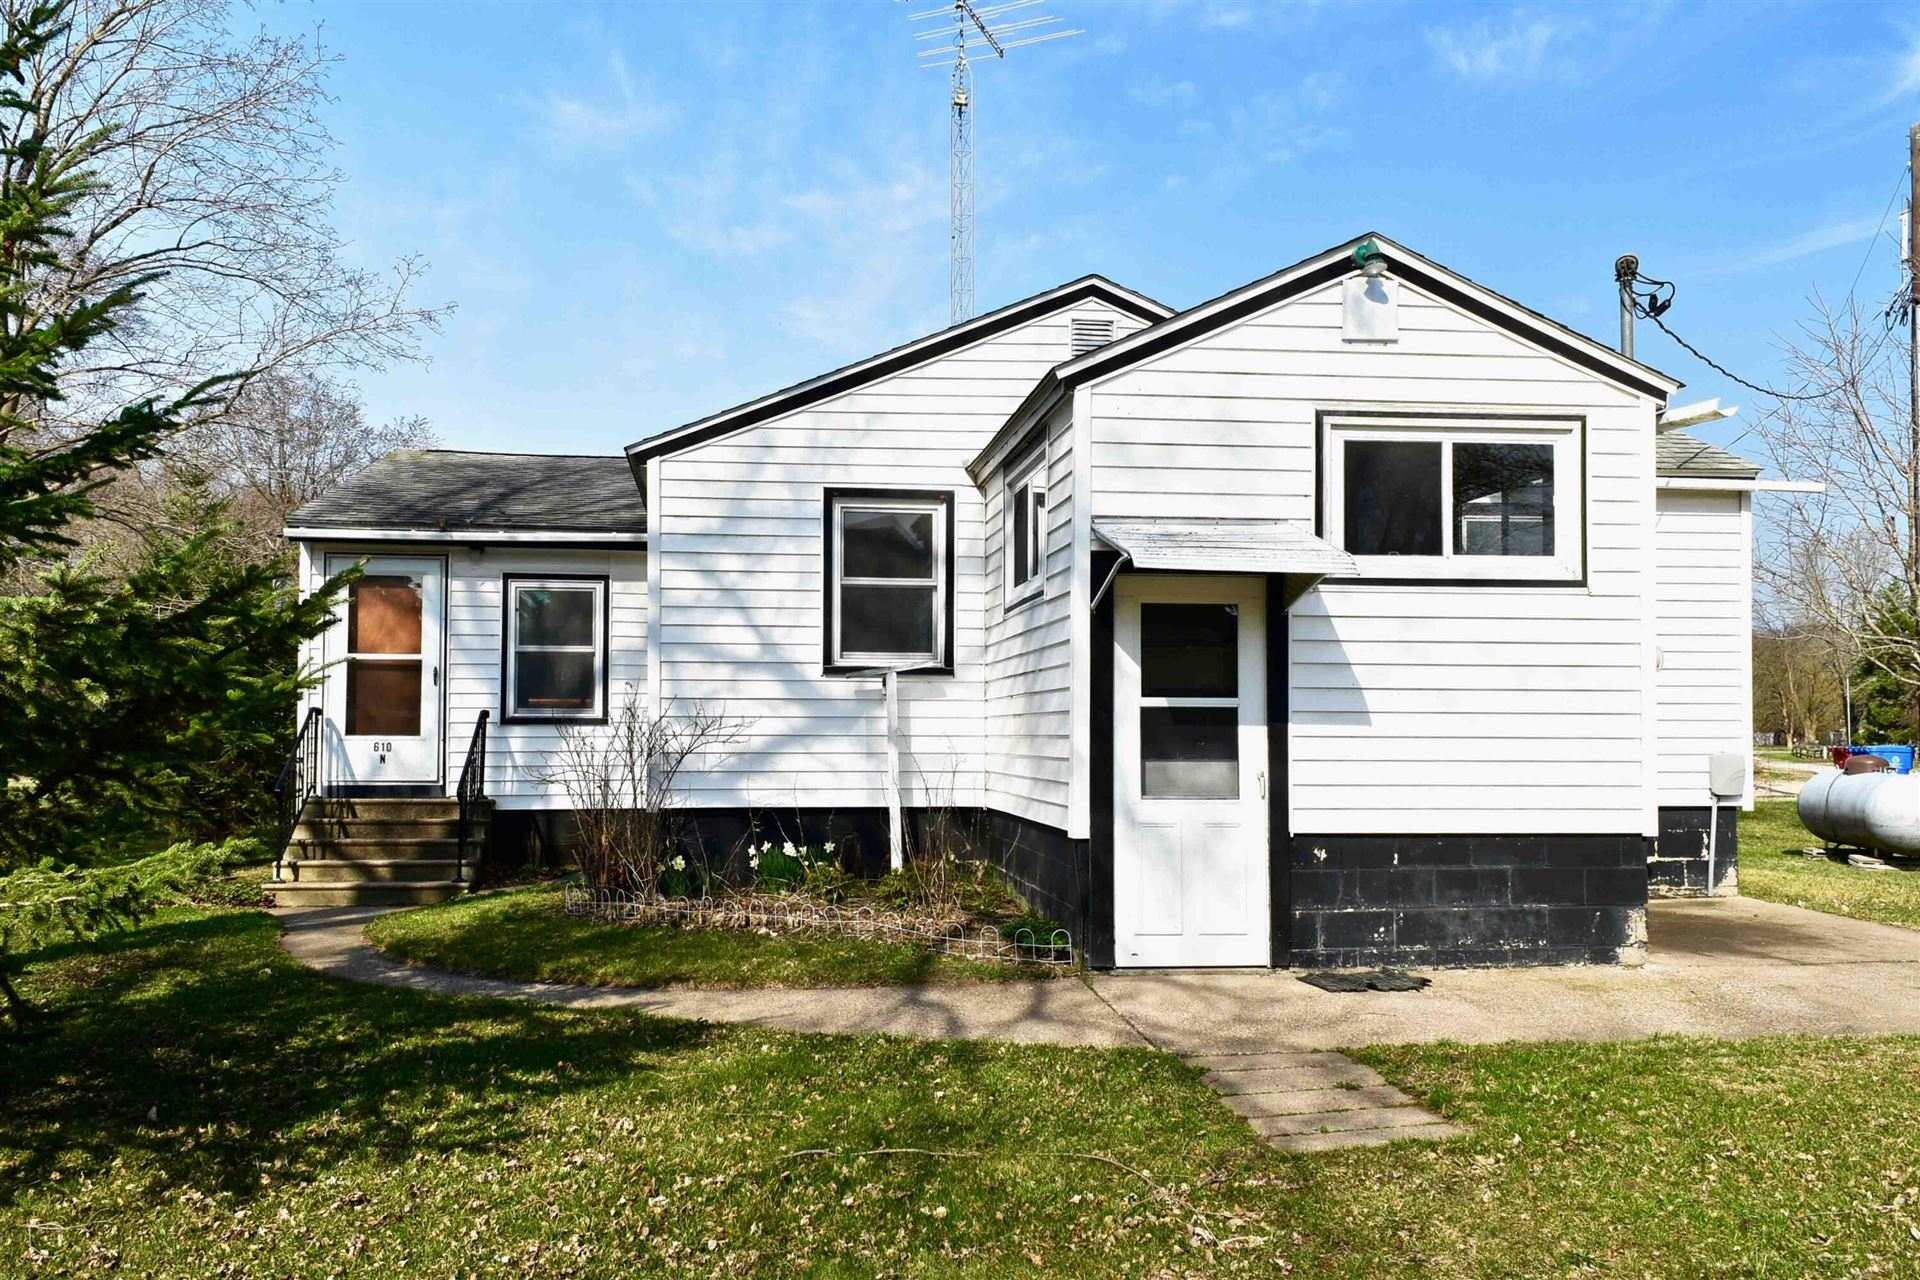 610 Prairie Island Rd N, Winona, MN 55987 - MLS#: 1733981